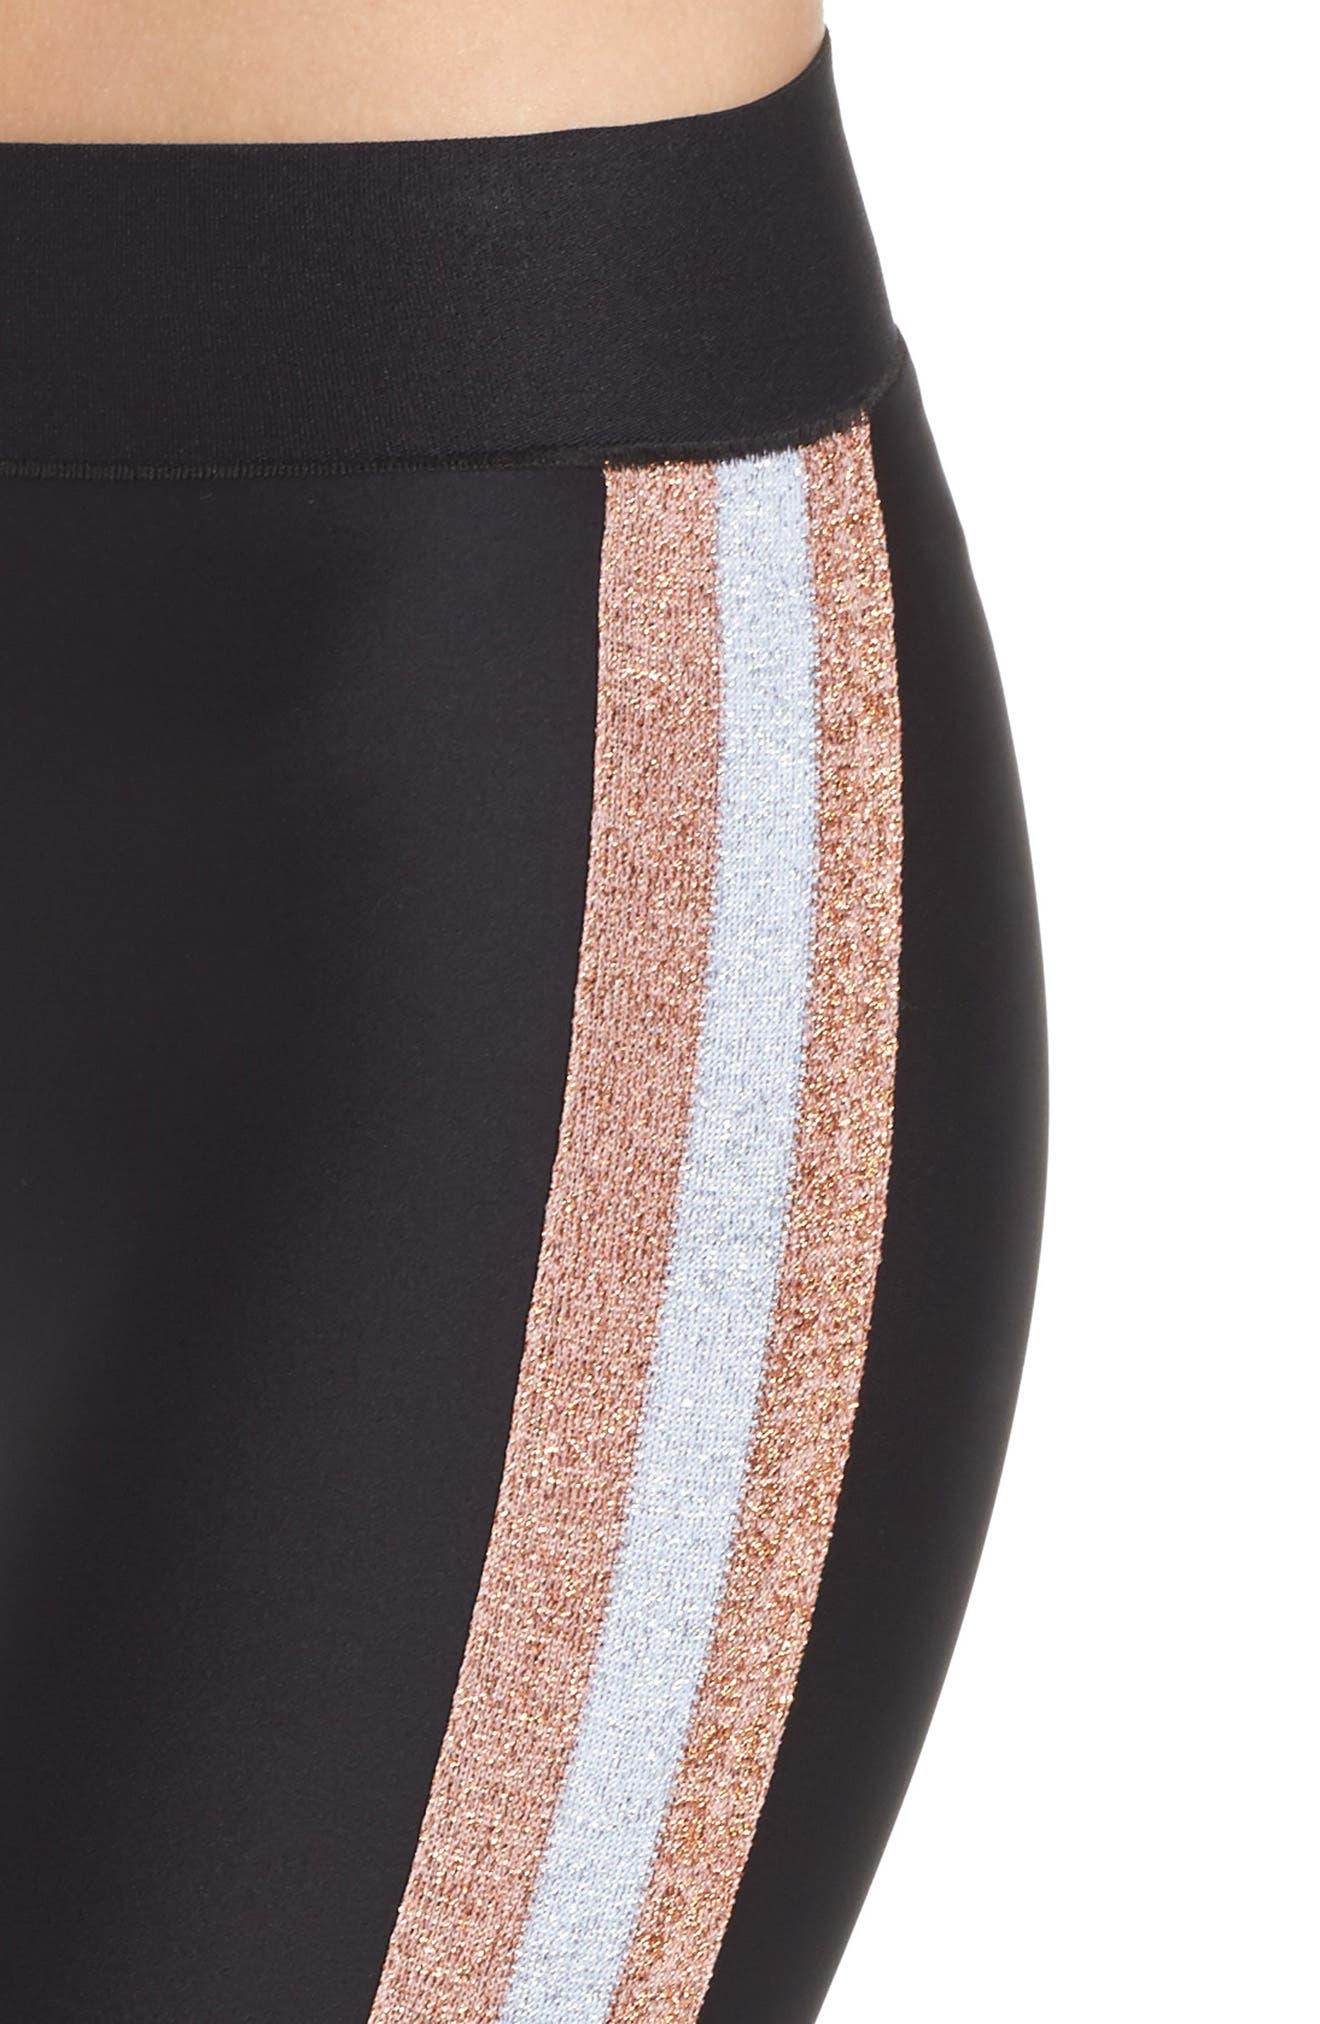 Ultra Lux Collegiate Leggings,                             Alternate thumbnail 4, color,                             Nero Rose Silver